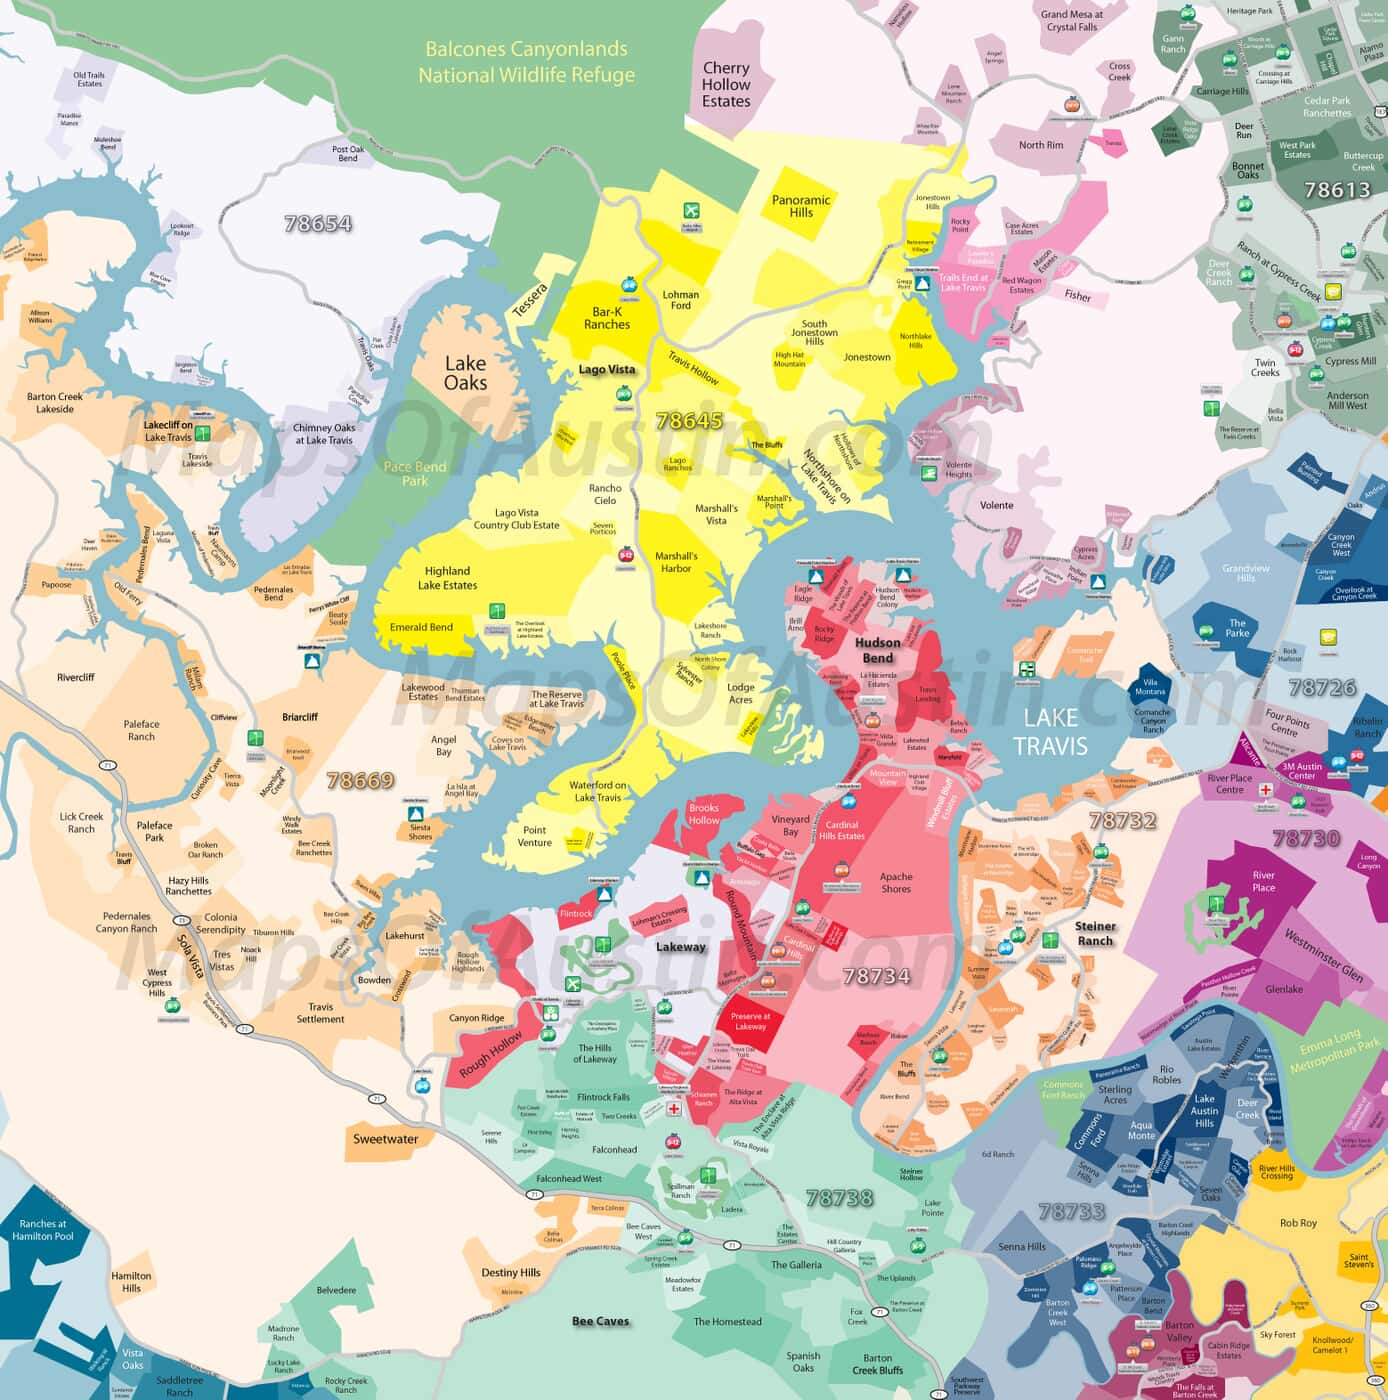 Map Of Austin Texas And Surrounding Areas.Lake Travis Tx Lake Travis Neighborhood Map Maps Of Austin